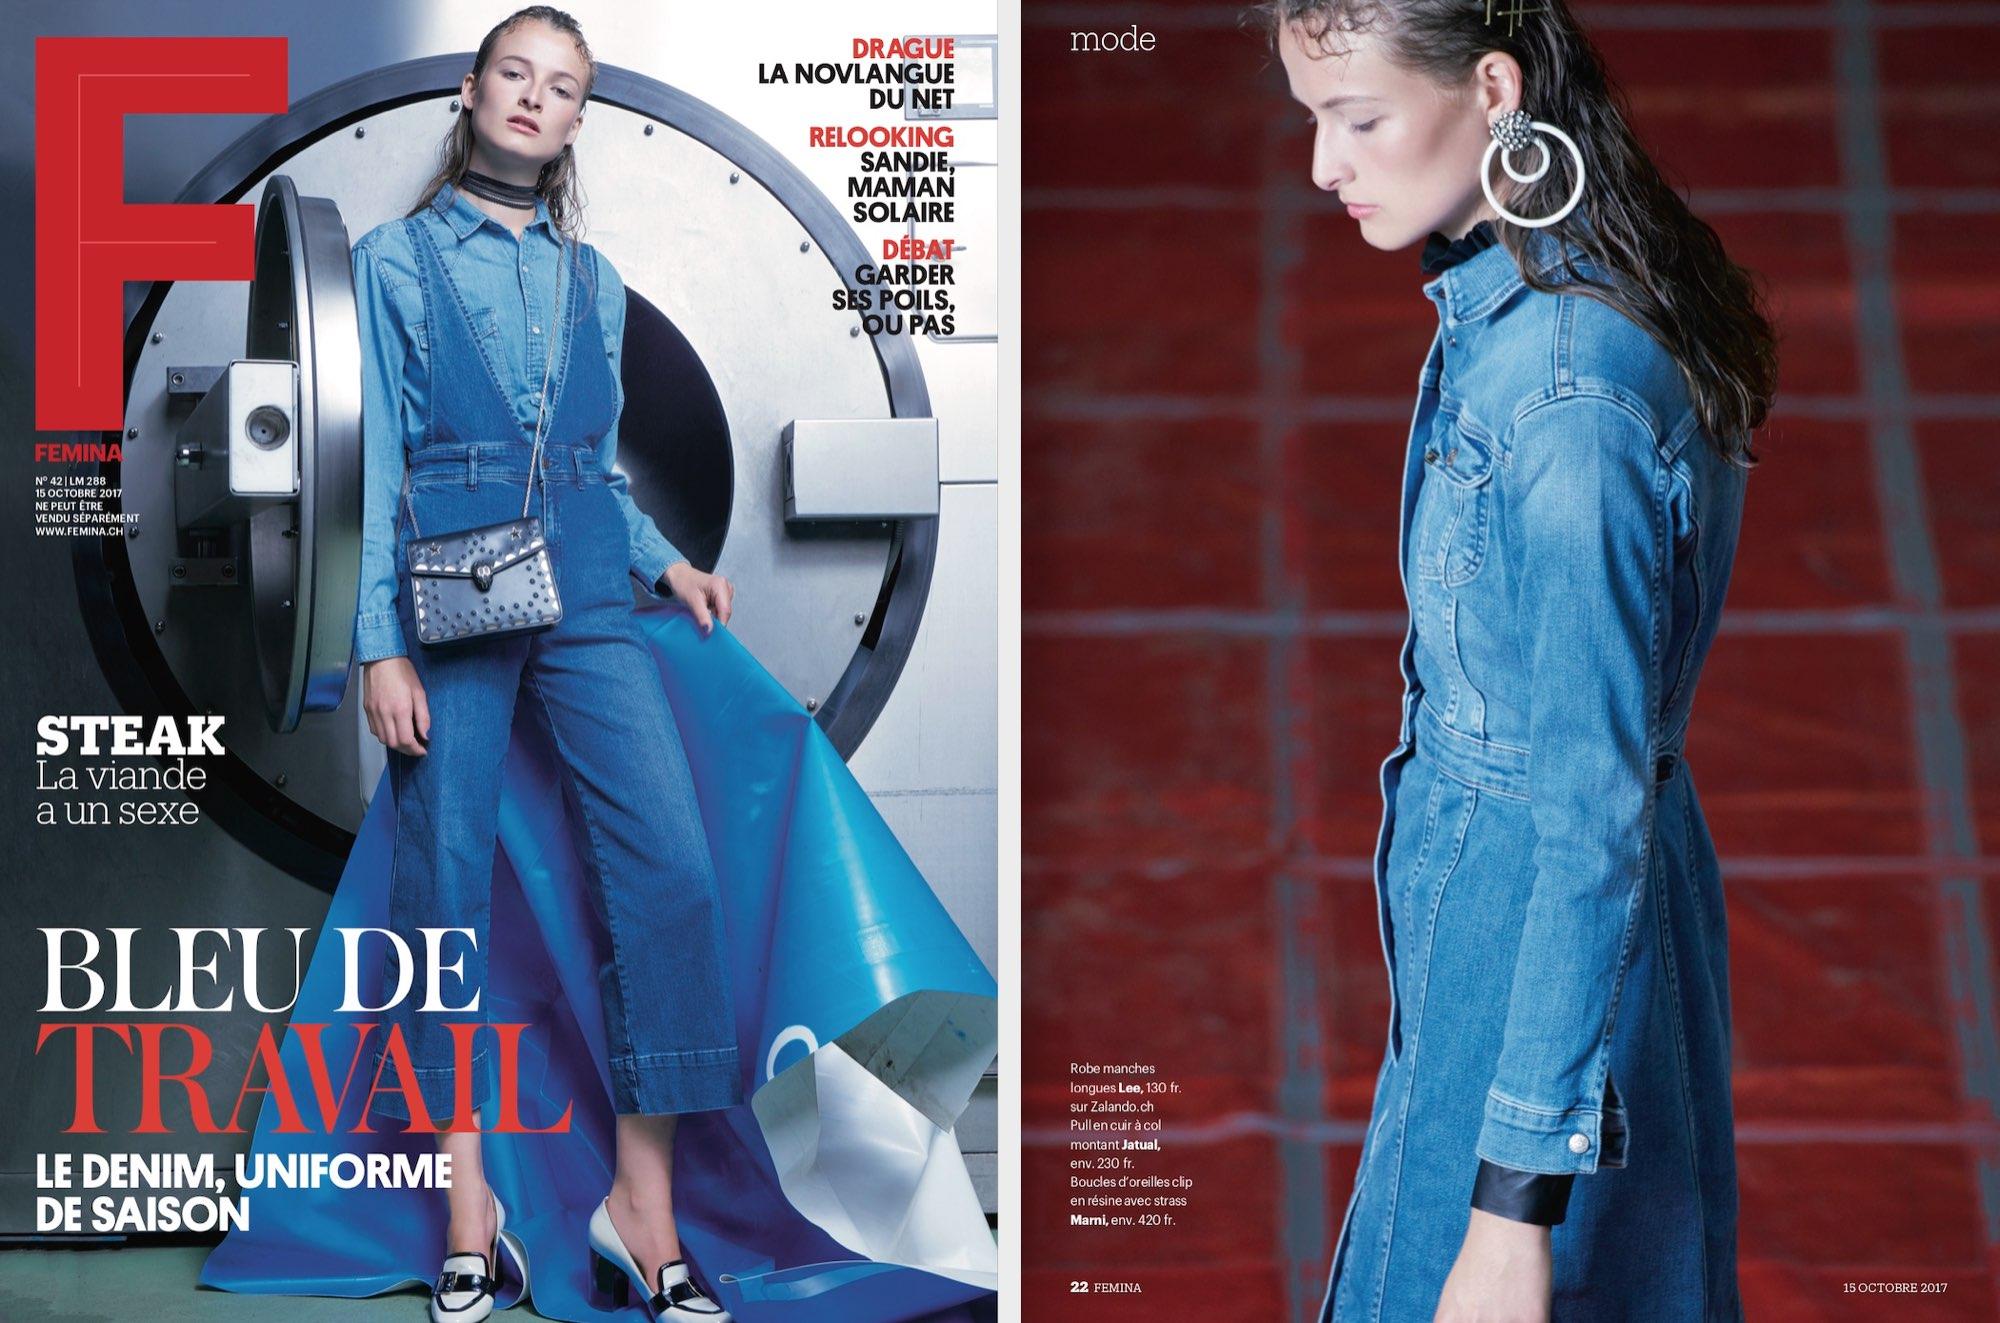 Hair, Nail, Make-up und Fashion styling portfolio / fabienne-pauli - femina-bleu-de-travail--jeans---ID291-1.jpeg?v=1587038619